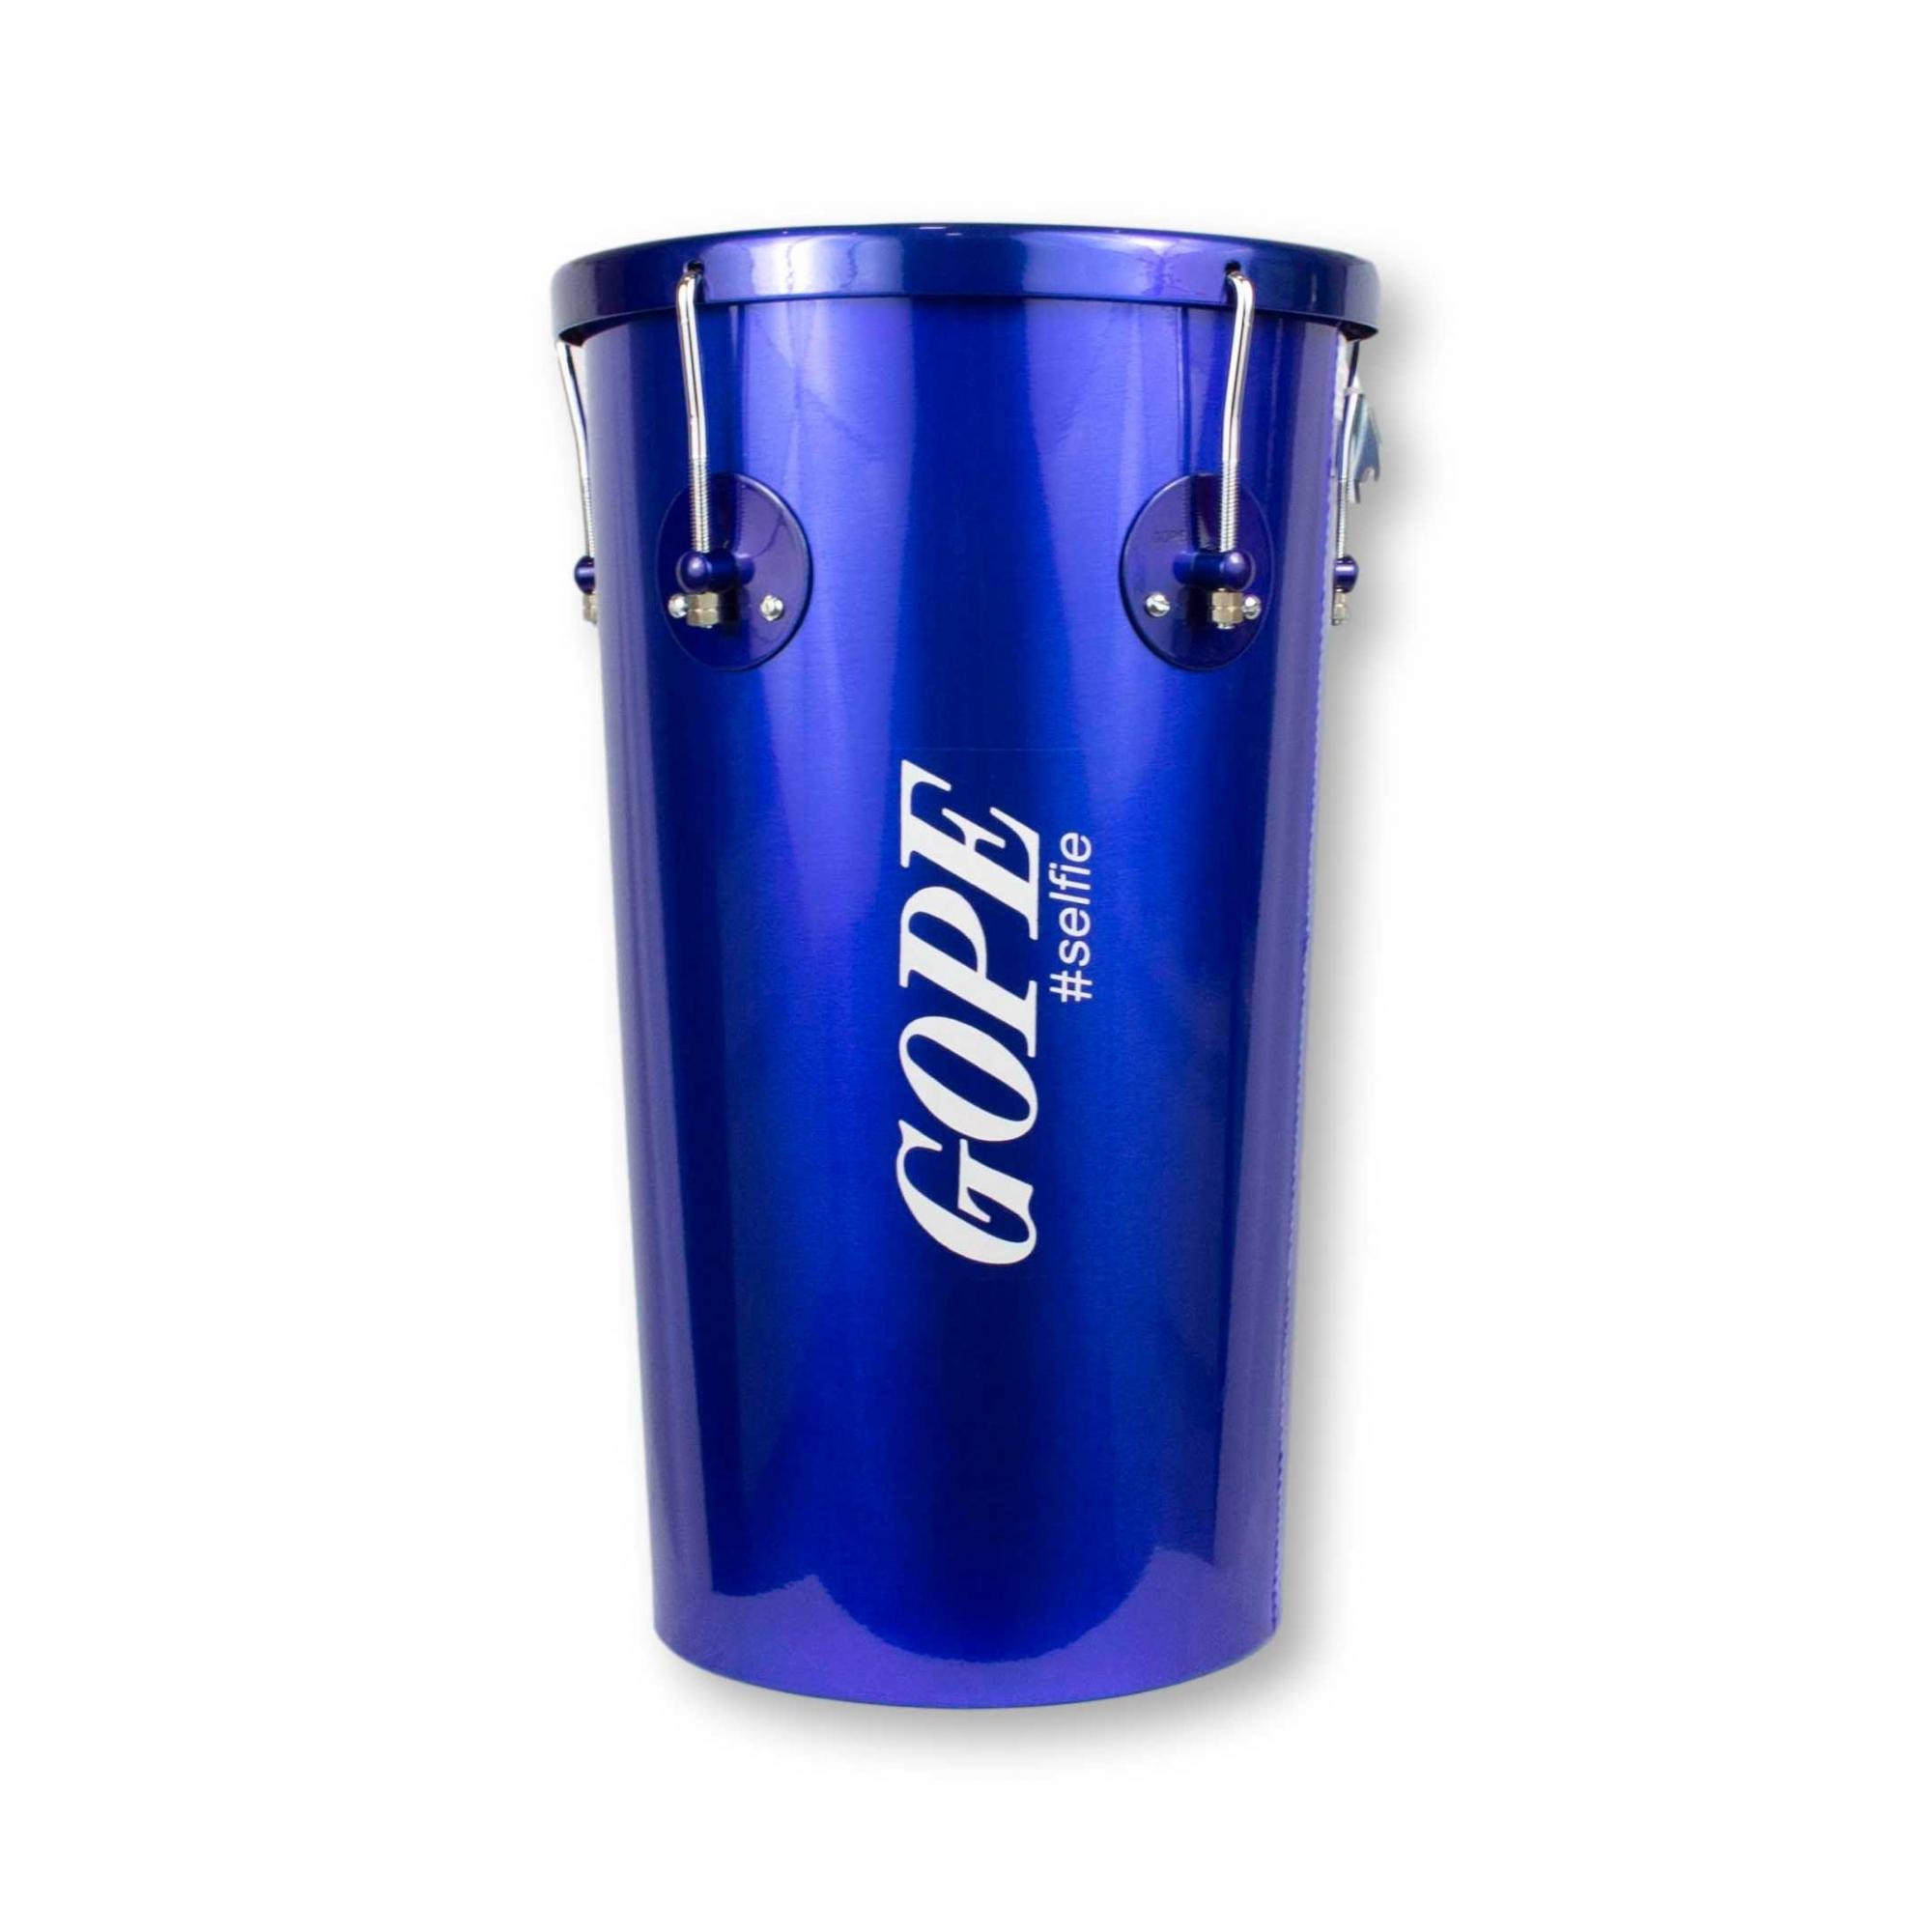 Rebolo Tantan Gope 10 pol 45 cm Selfie Azul